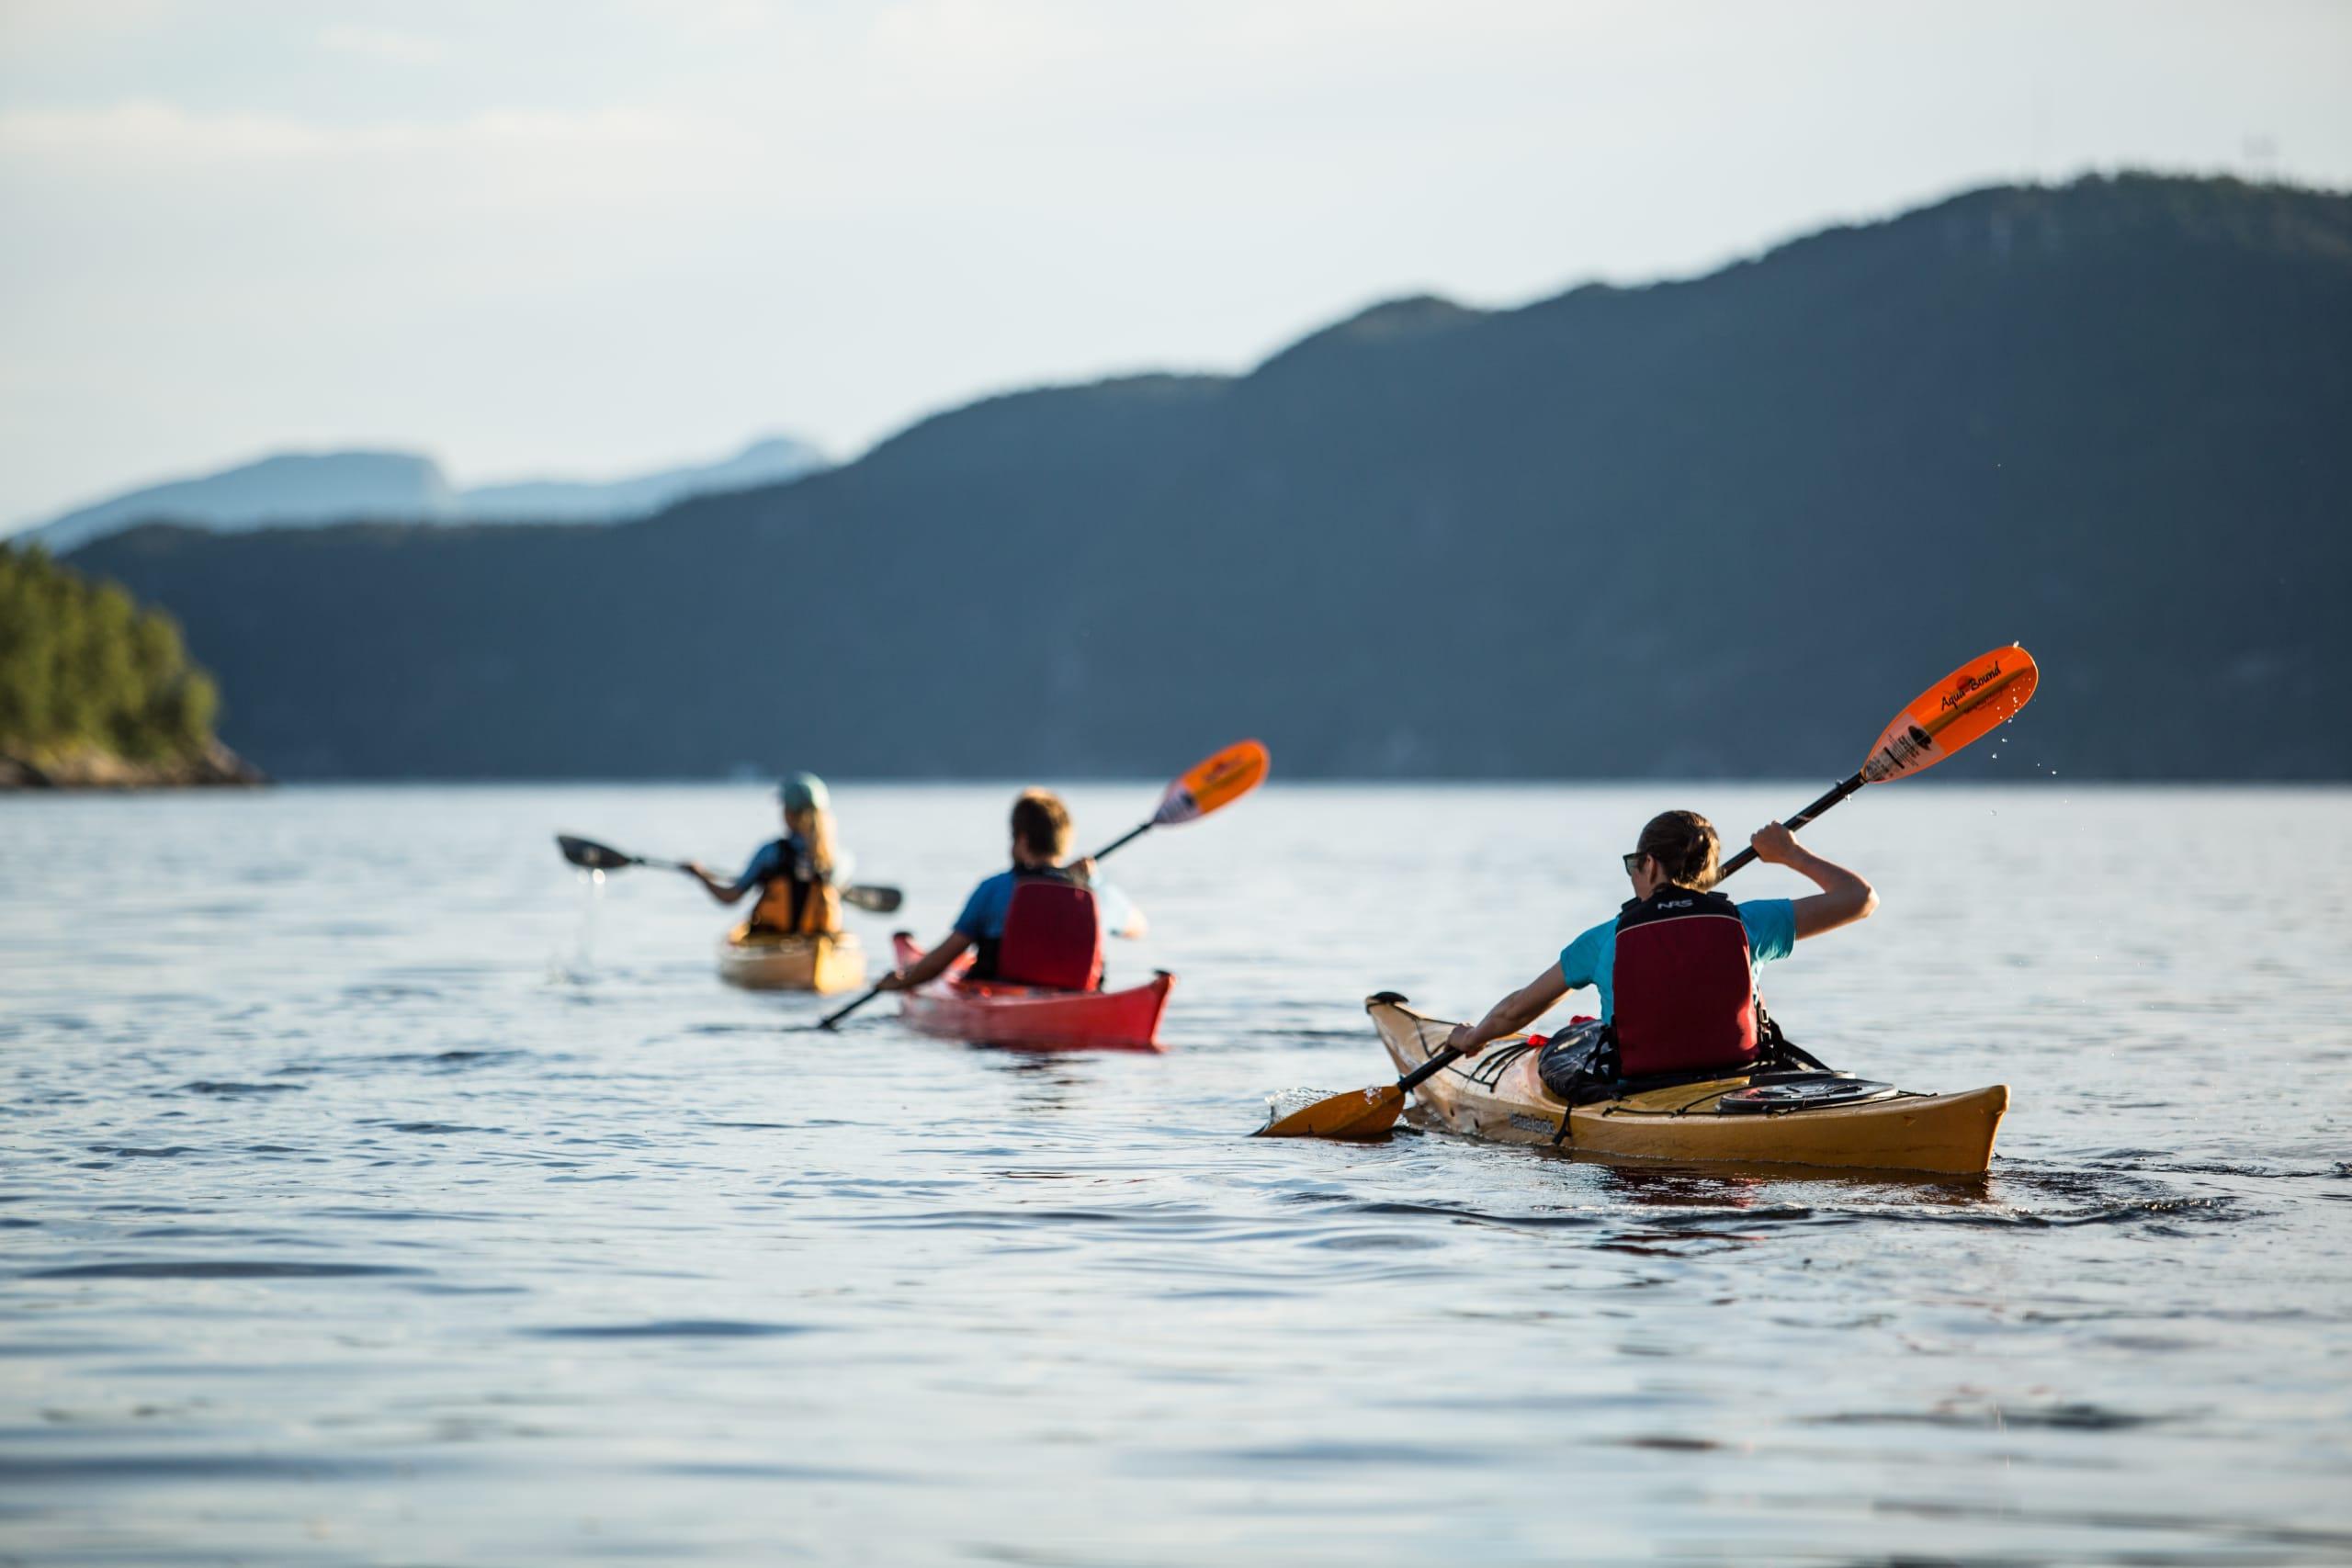 Kayaking in Hardangerfjord starting from Jondal